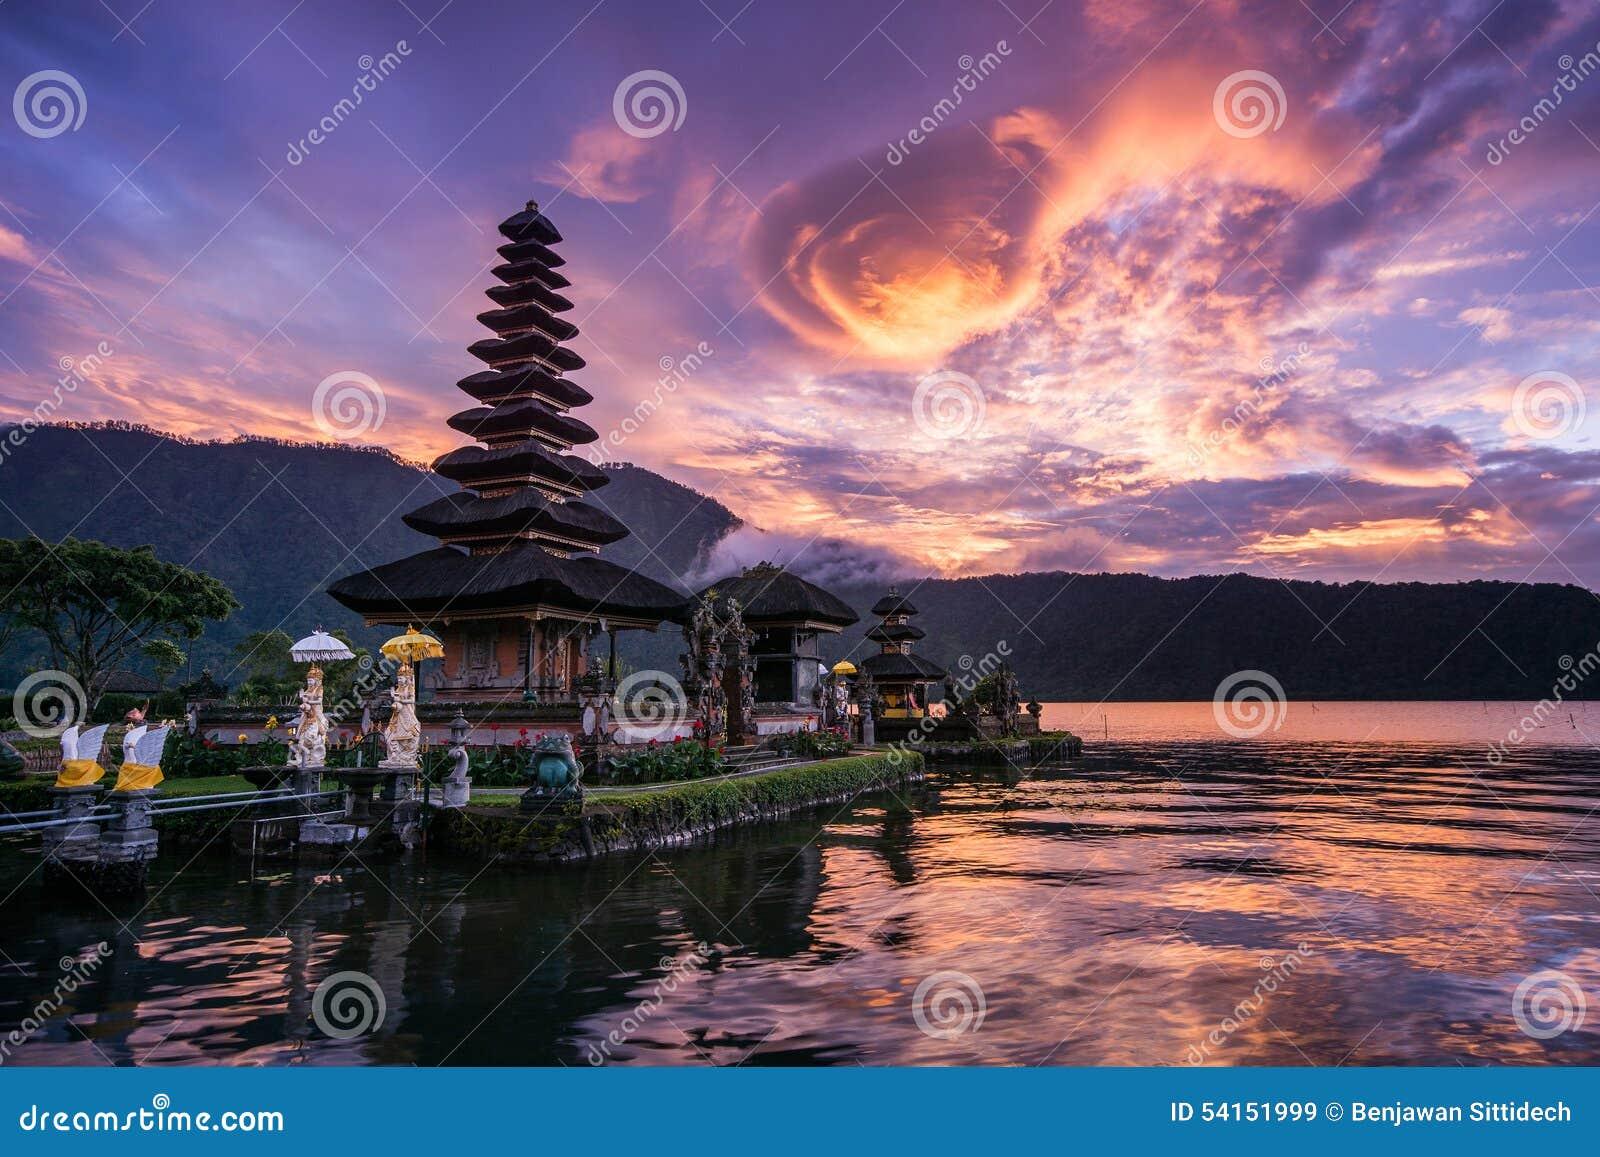 Pura Ulun Danu Bratan bei Bali, Indonesien